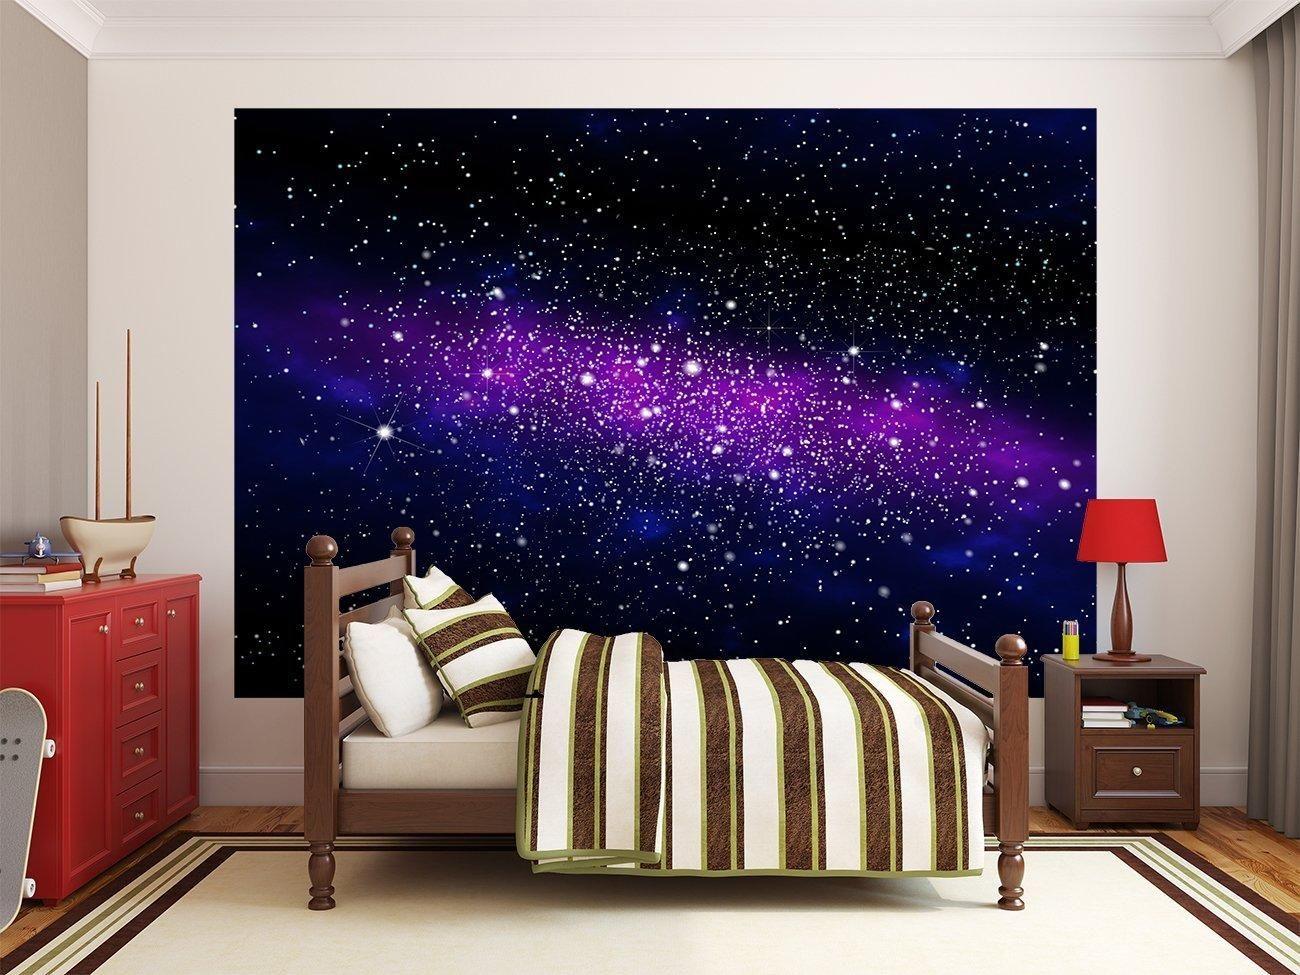 Sternenhimmel Schlafzimmer ~ Fototapete im weltall u galaxie u sternenhimmel fototapeten d